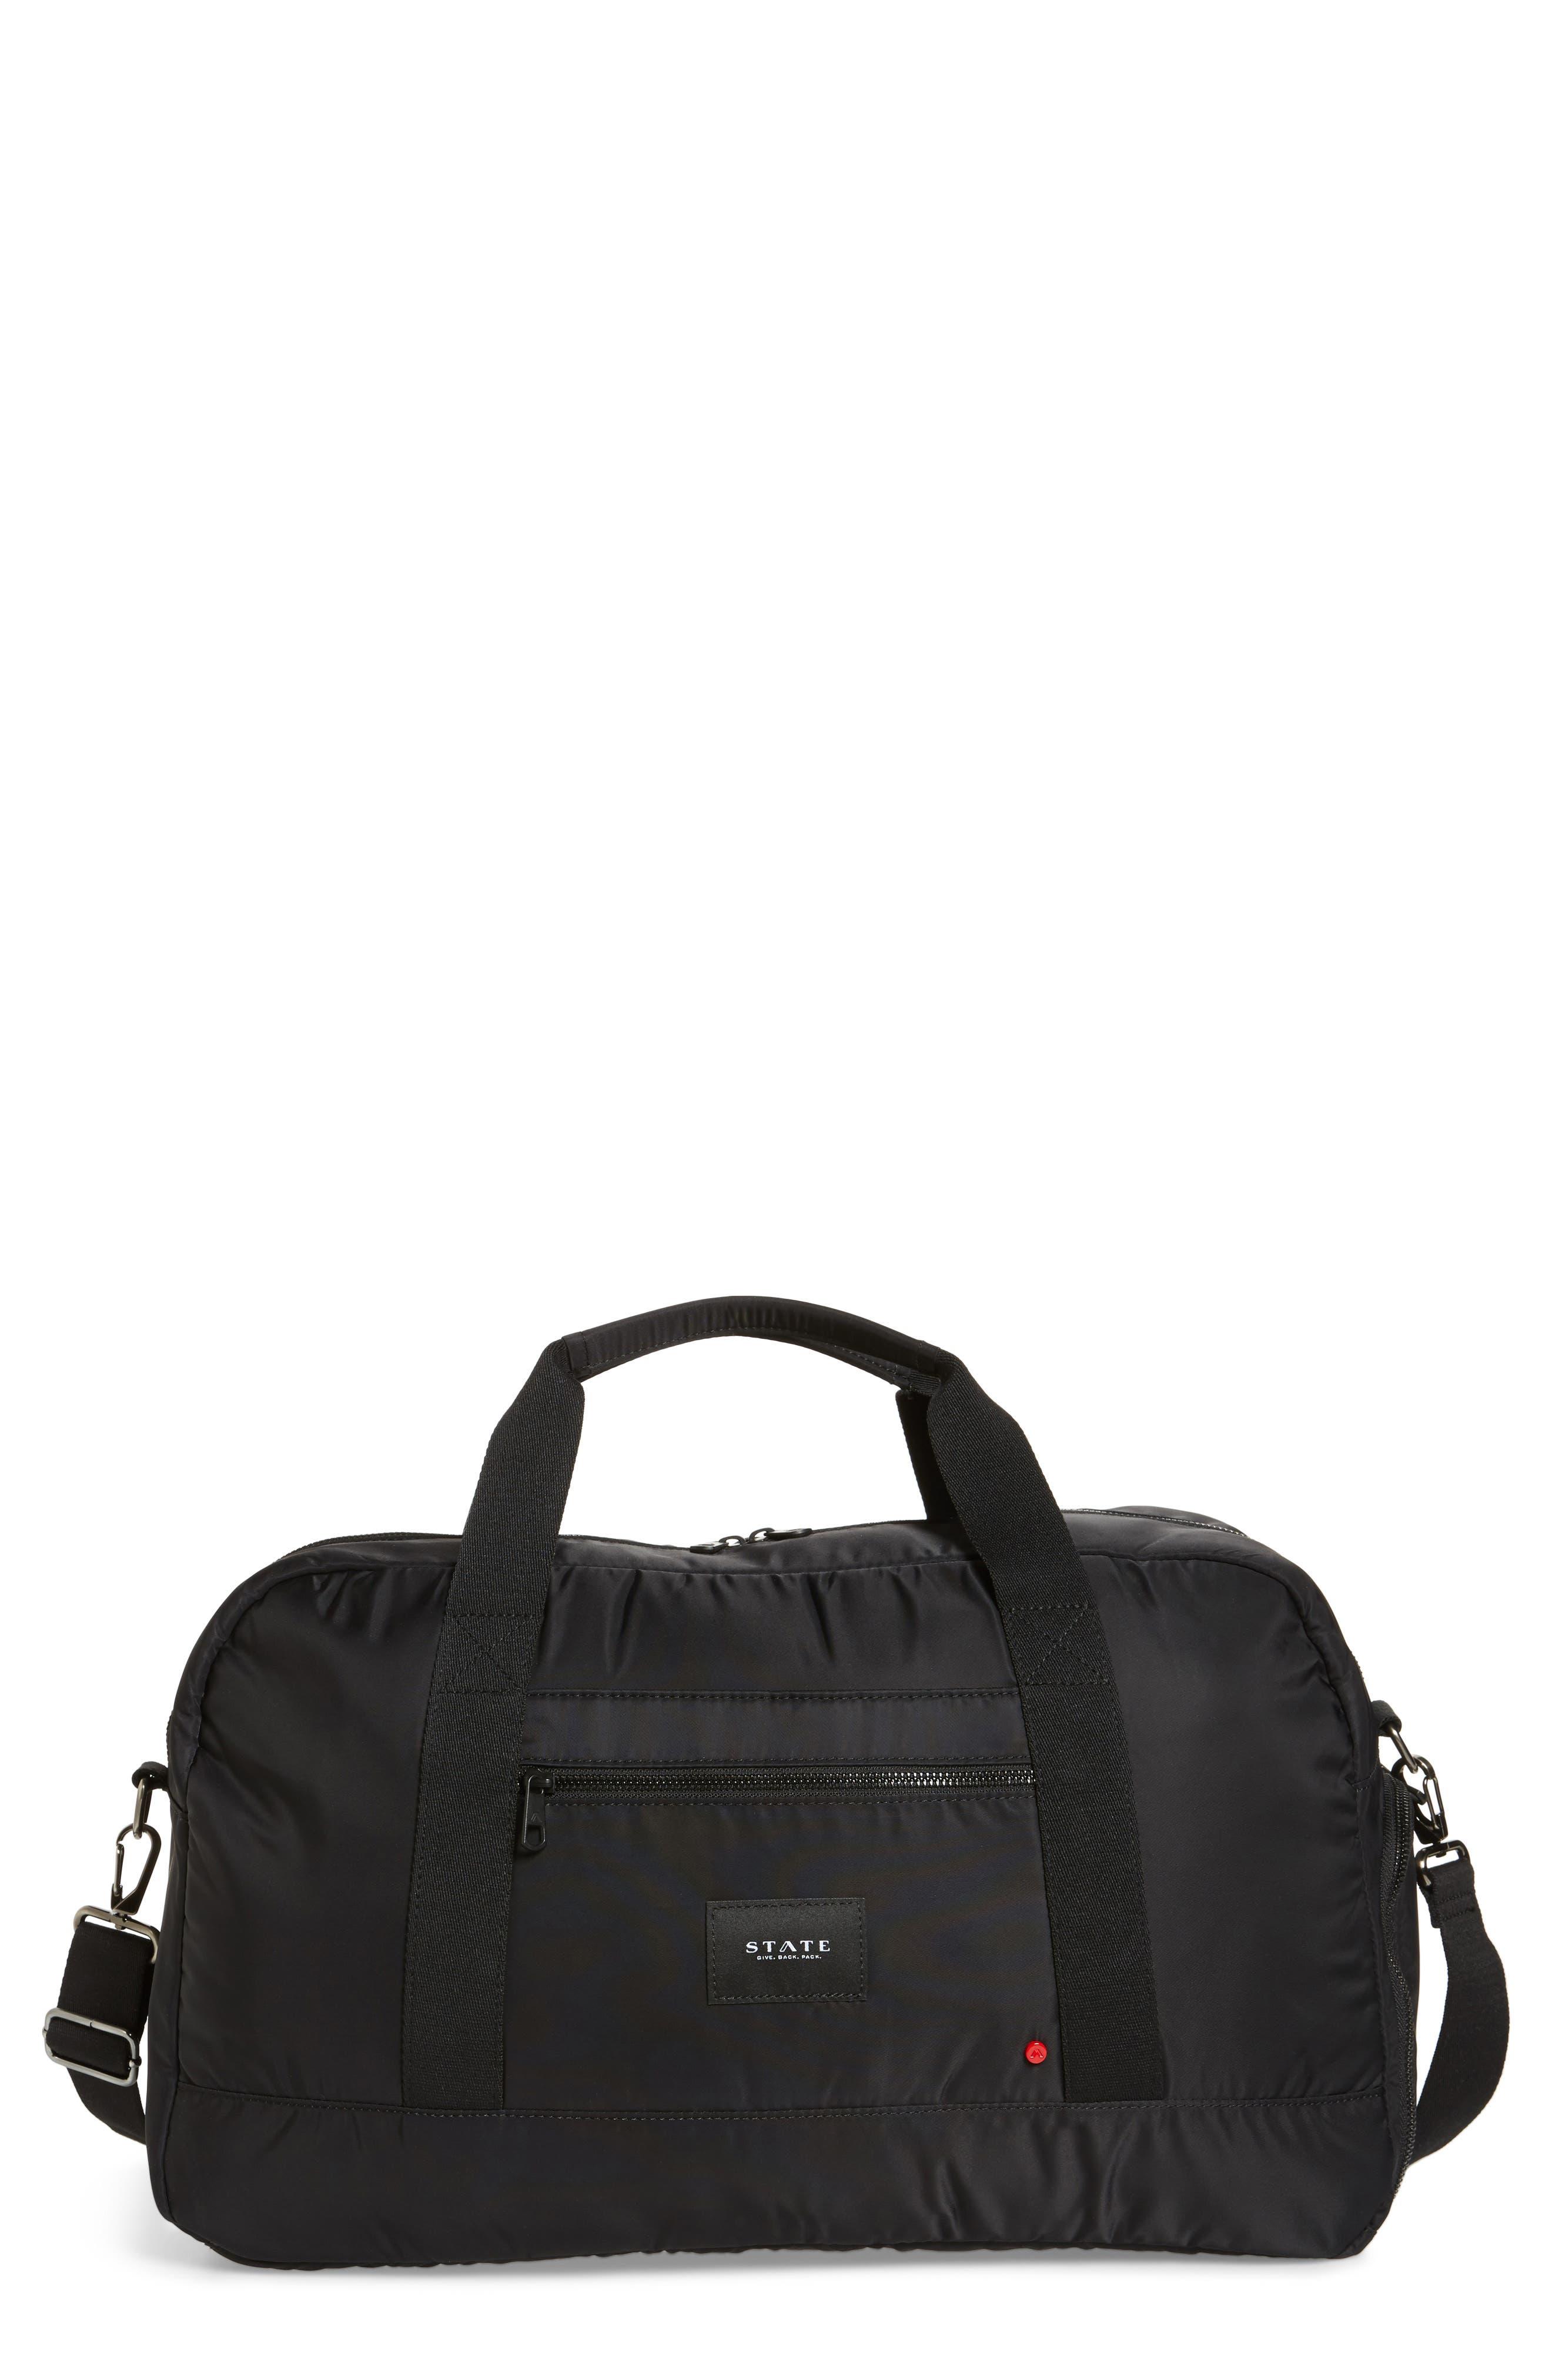 STATE The Heights - Franklin Nylon Duffel Bag - Black